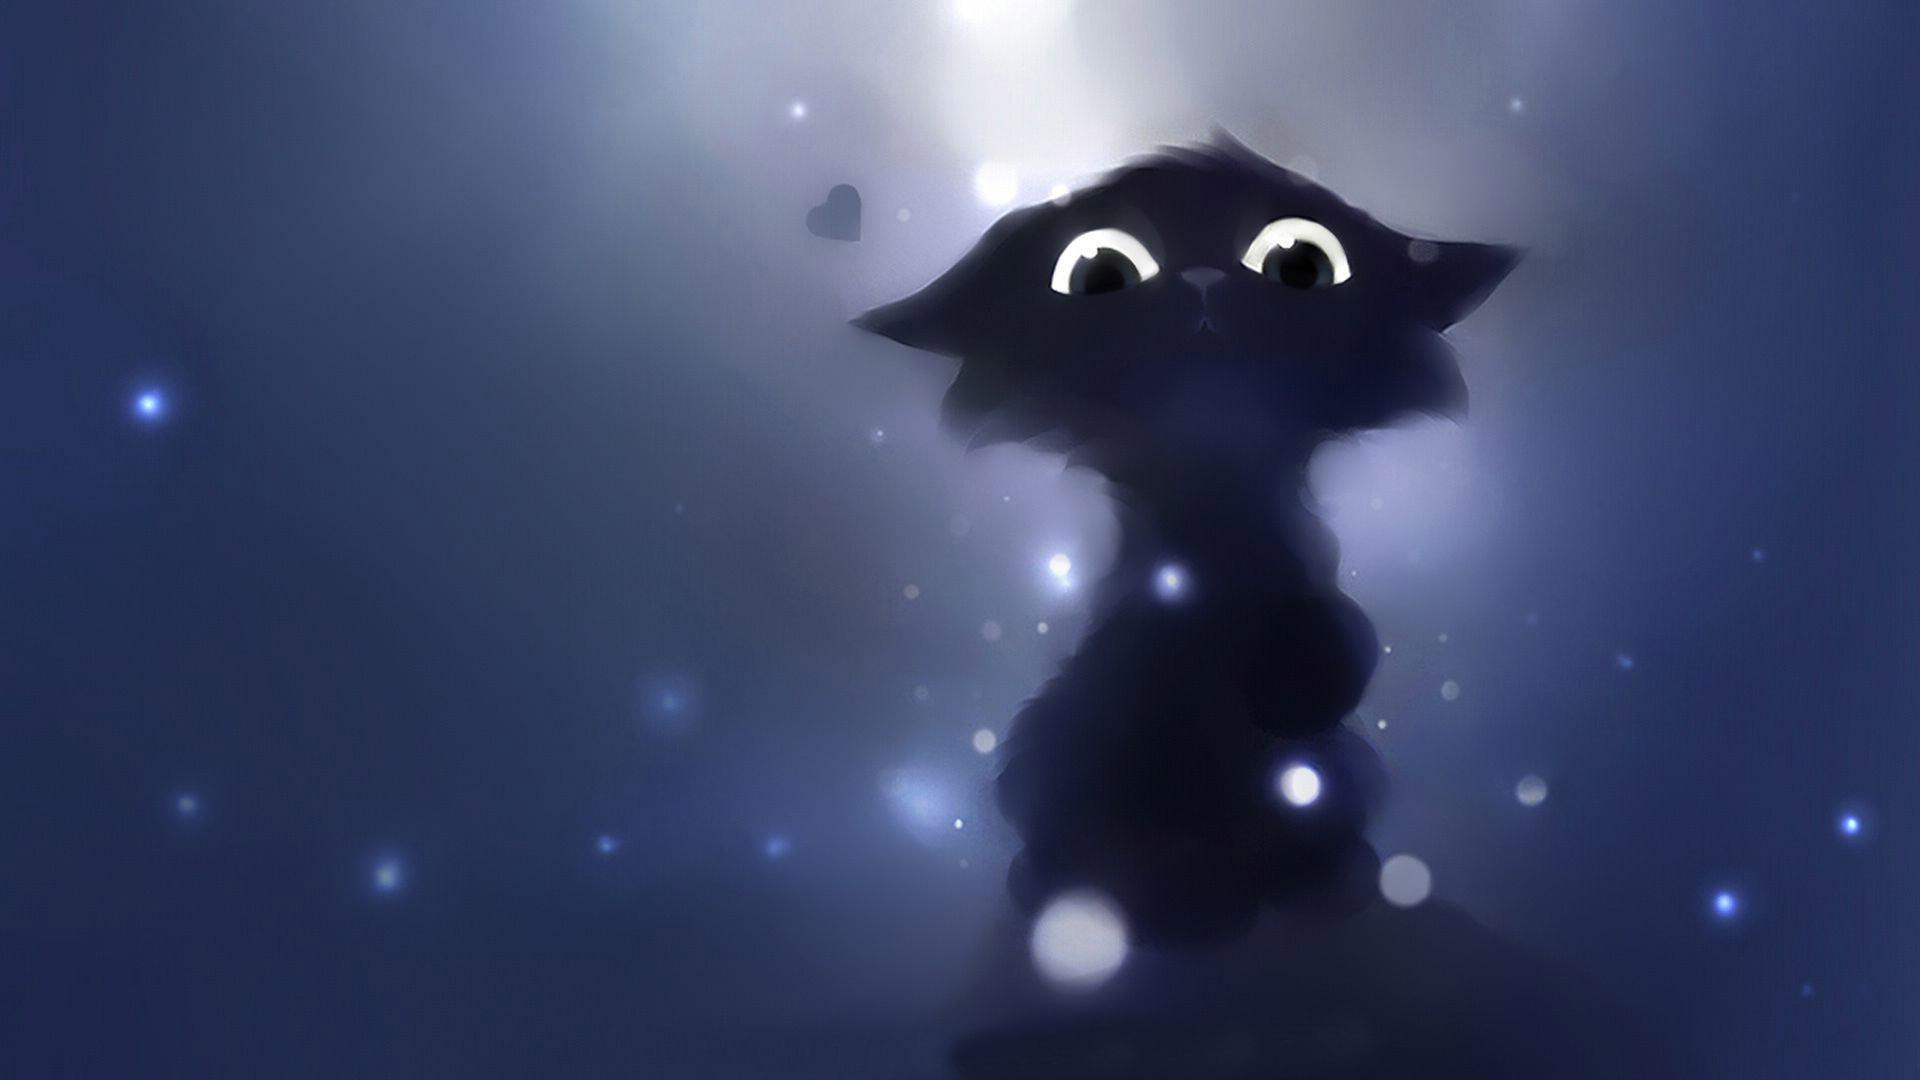 1920x1200 black cat halloween wallpaper pc. Hd Anime Cat Background Pixelstalk Net